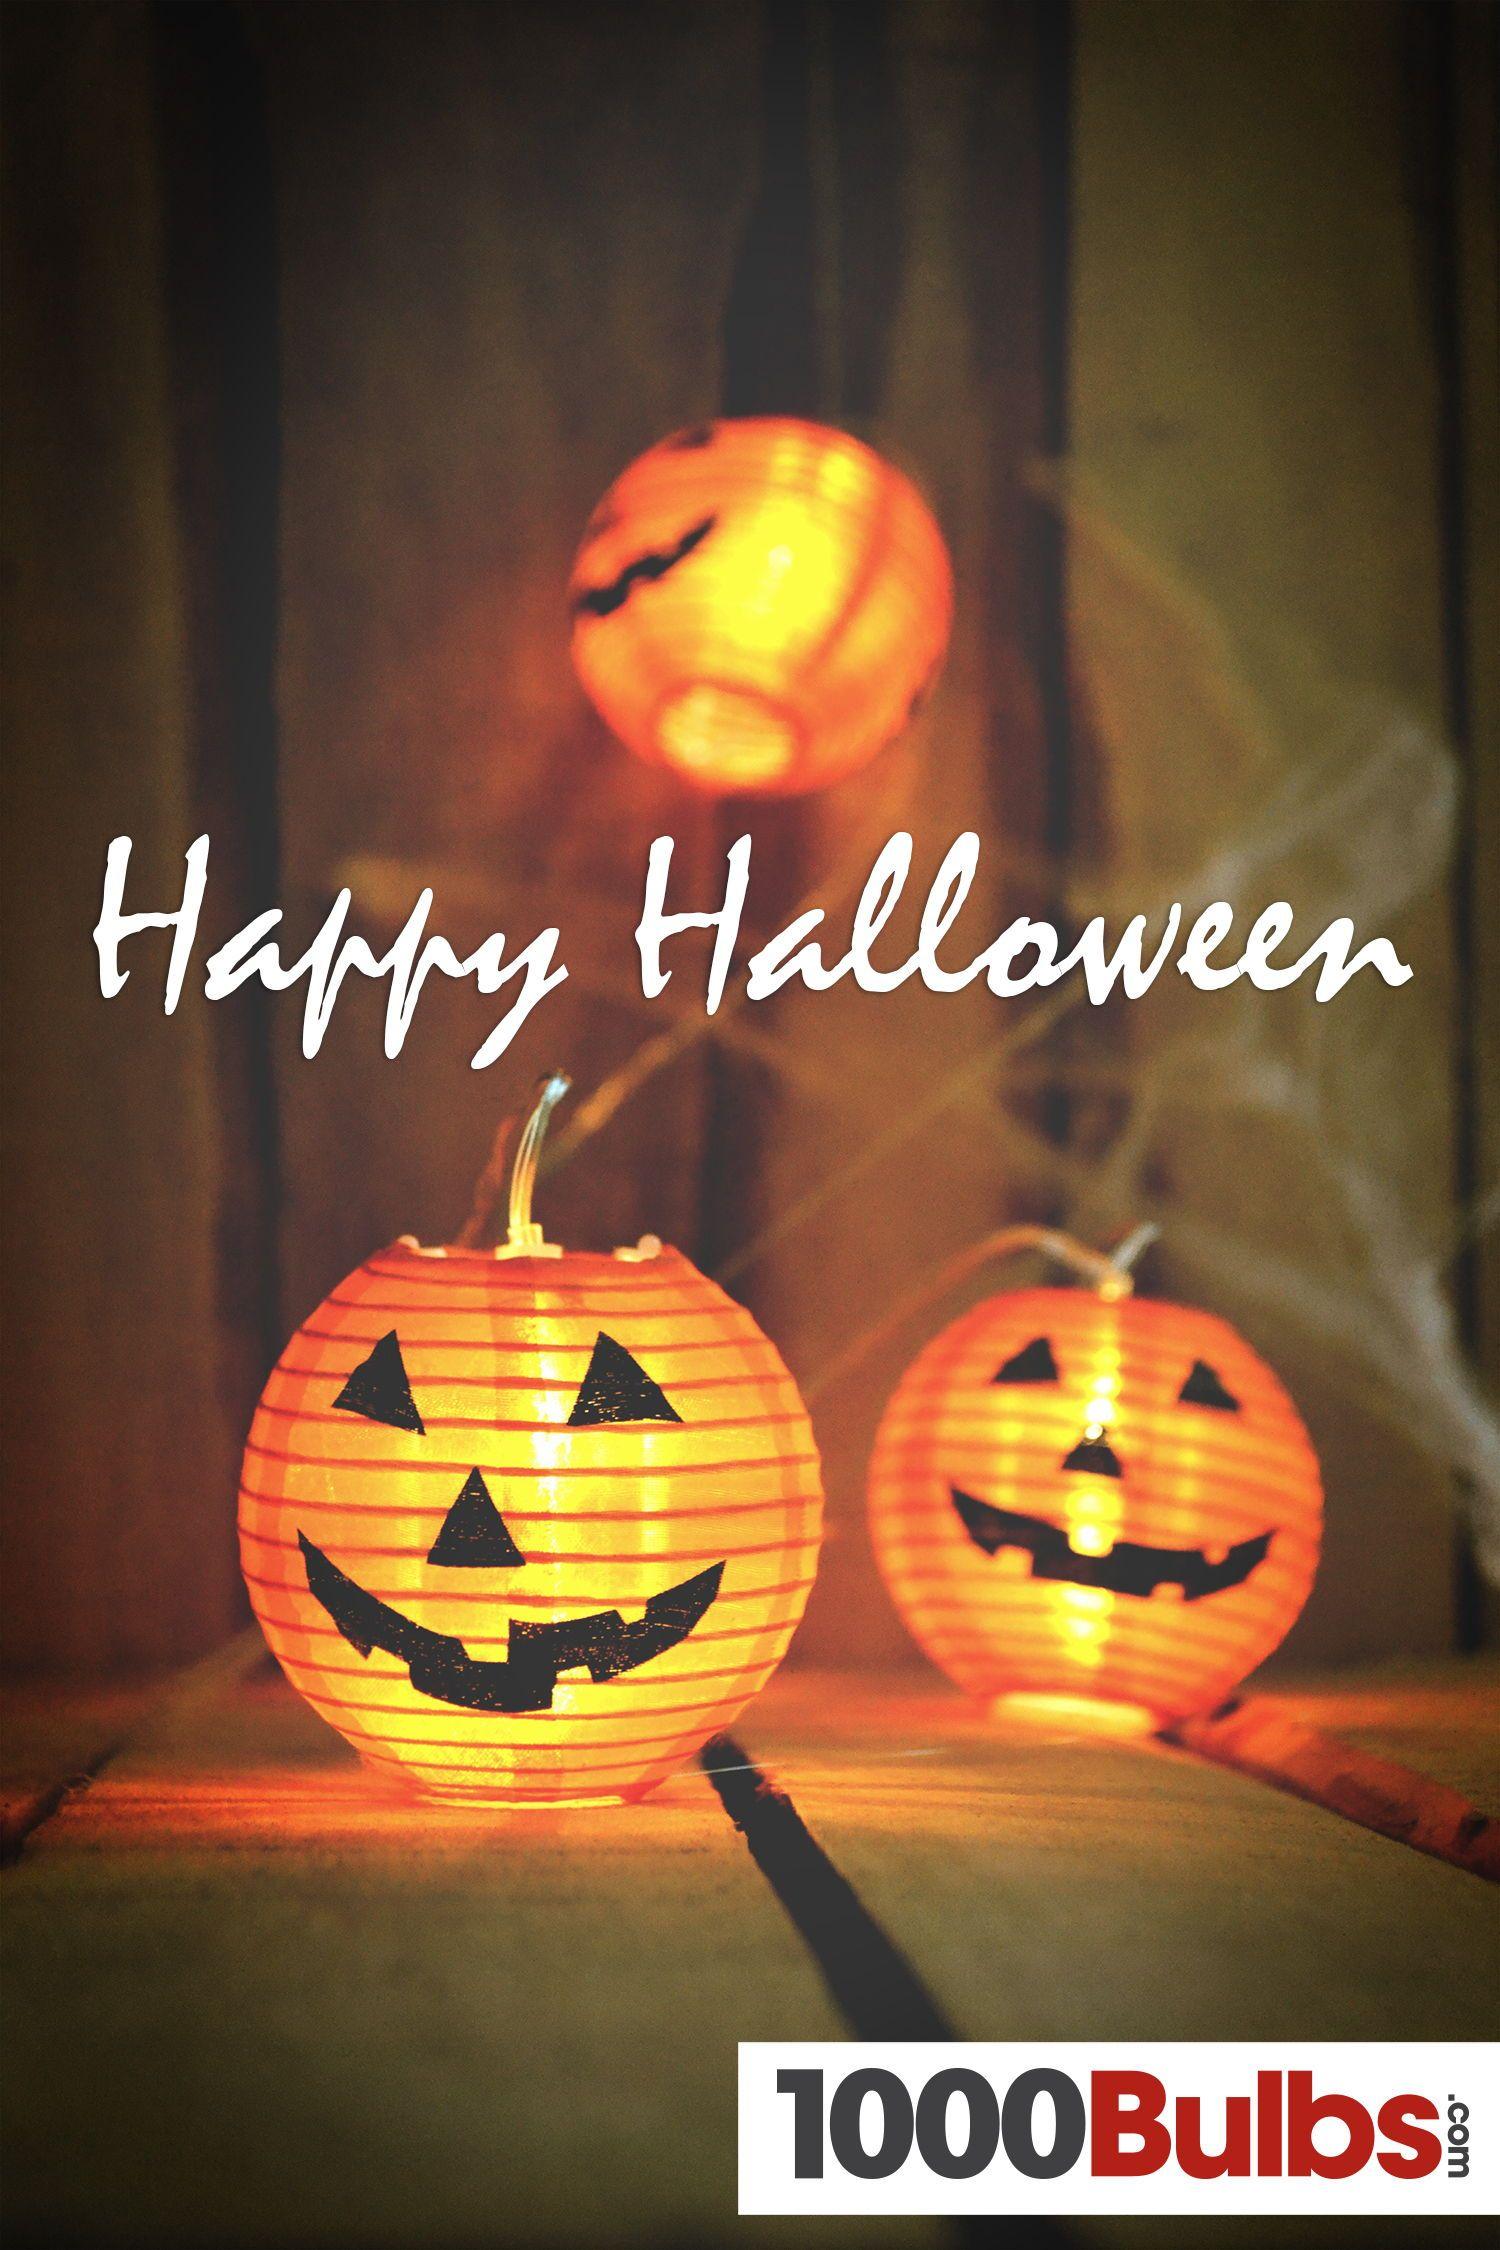 Happy Halloween From 1000bulbs Com Halloween Cans Halloween 1000bulbs Com